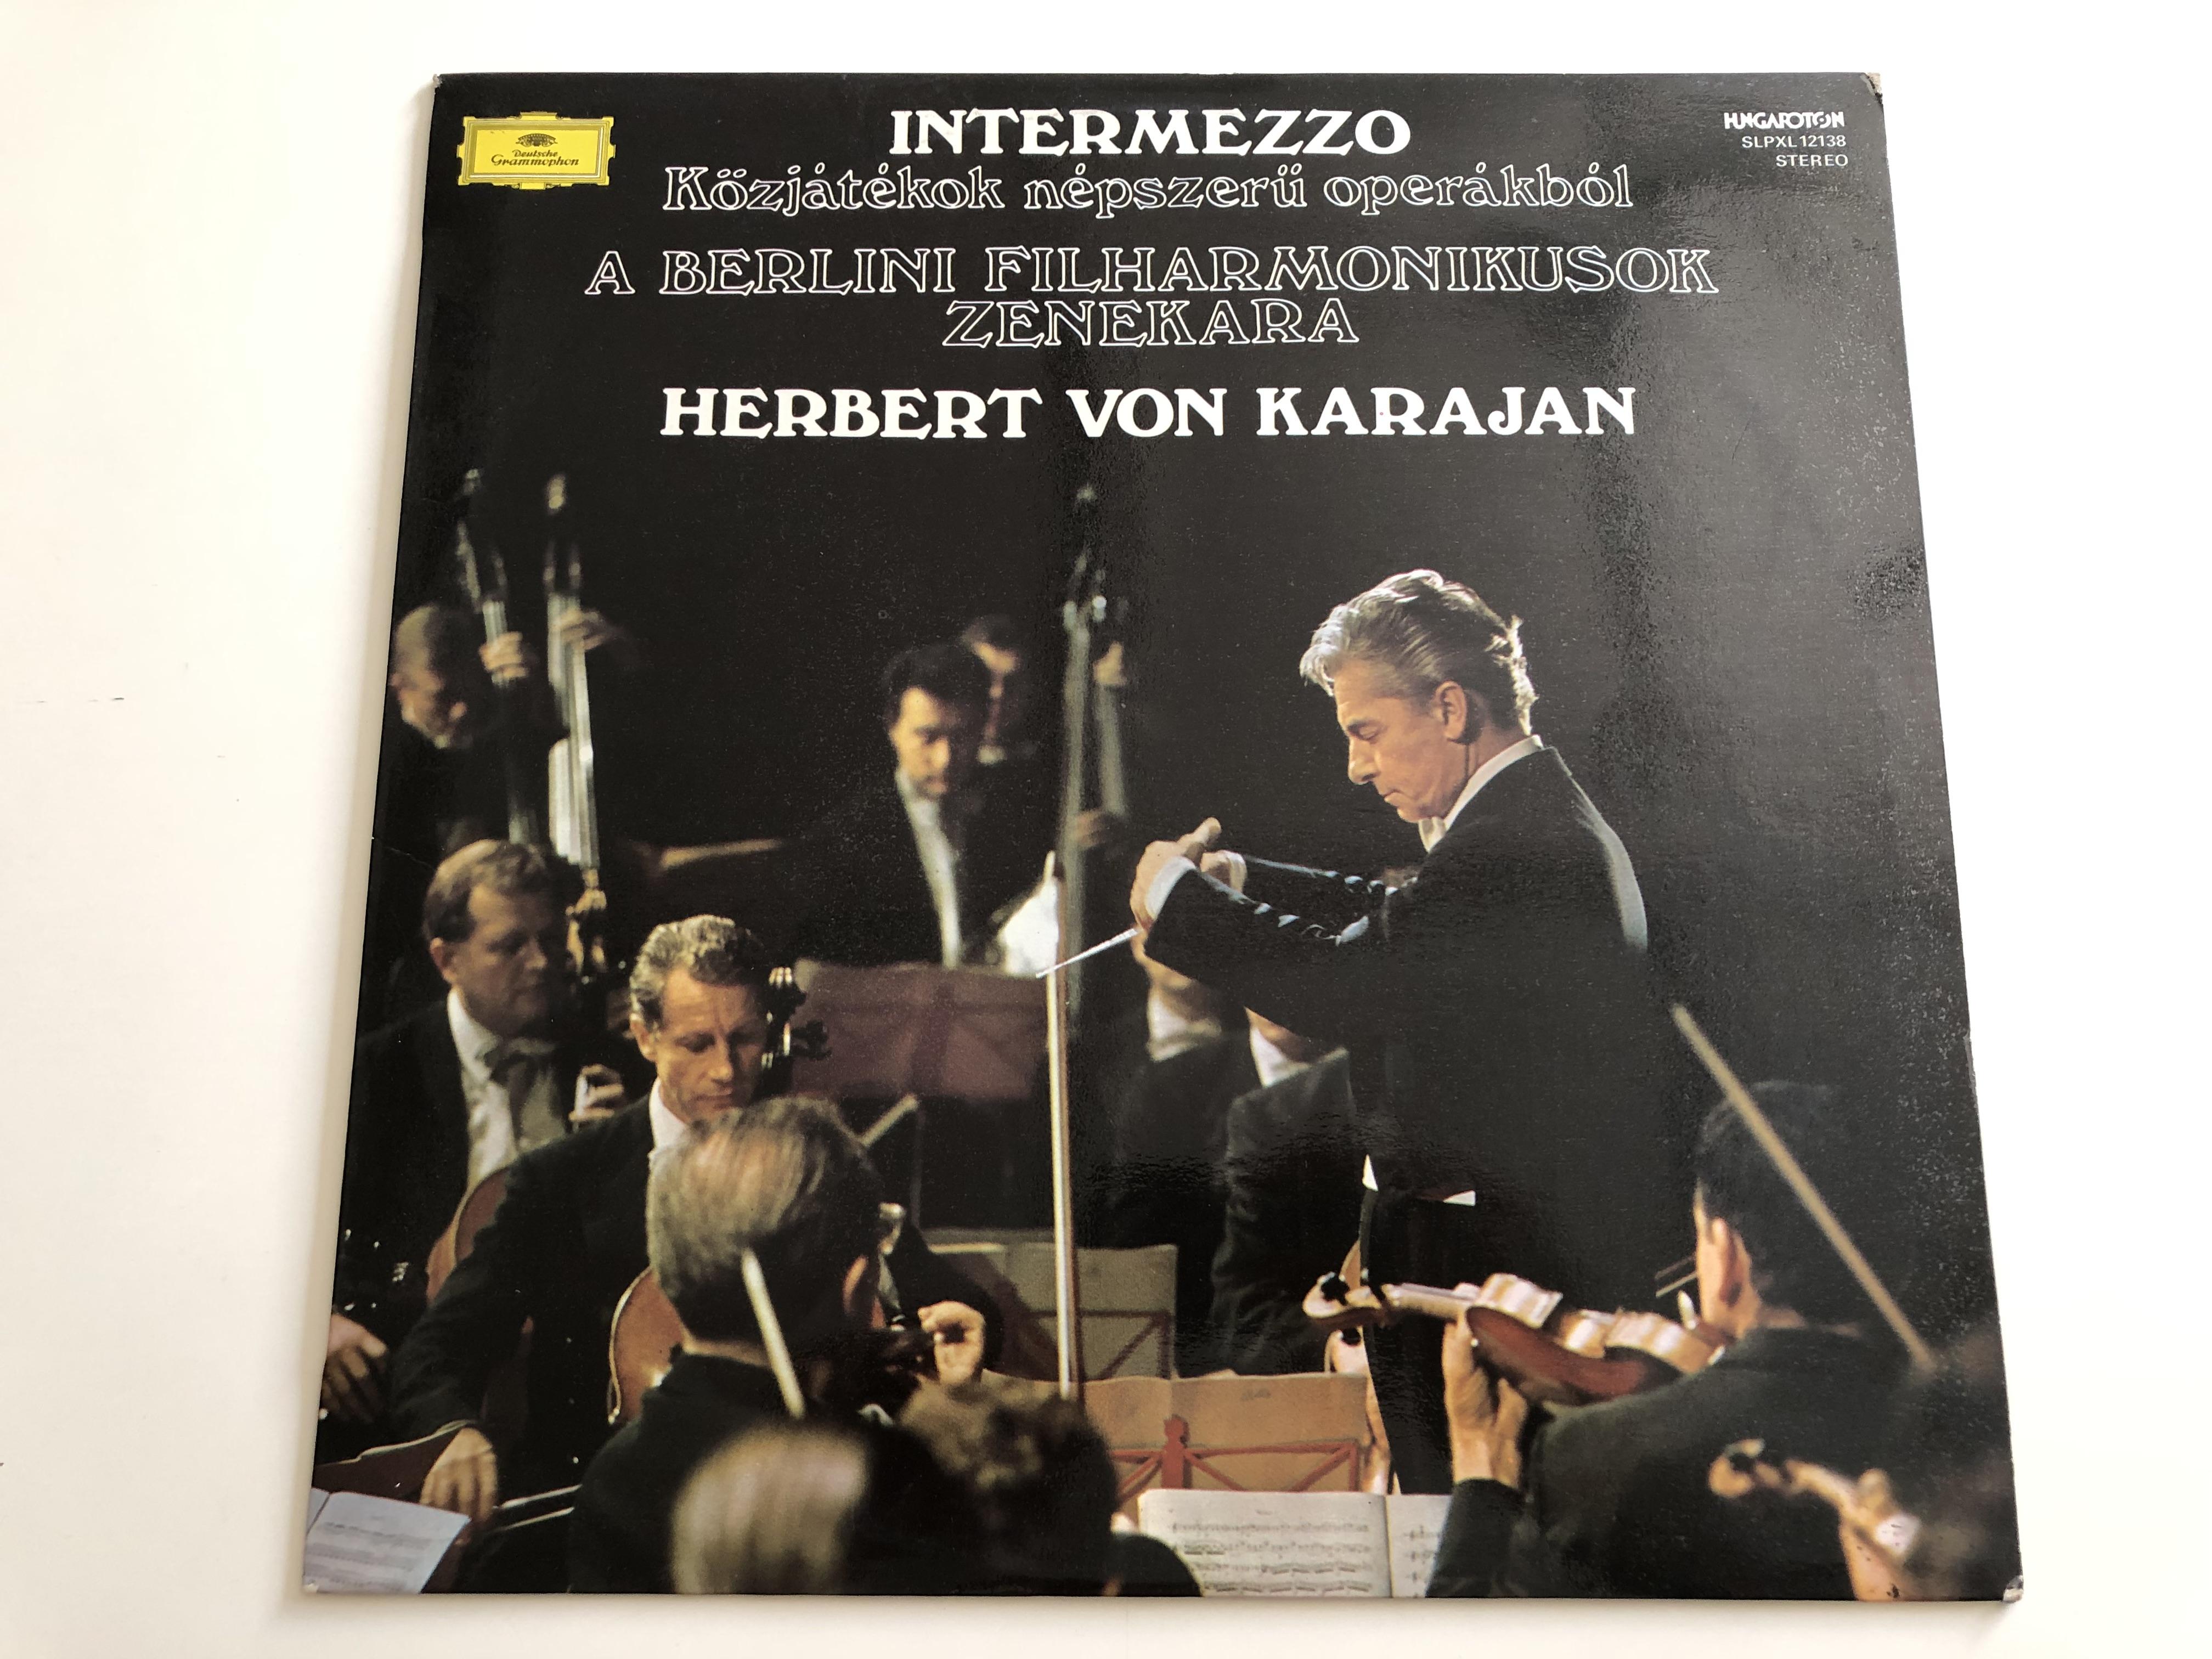 intermezzo-k-zj-t-kok-n-pszer-oper-kb-l-a-berlini-filharmonikusok-zenekara-herbert-von-karajan-hungaroton-lp-stereo-slpxl-12138-1-.jpg